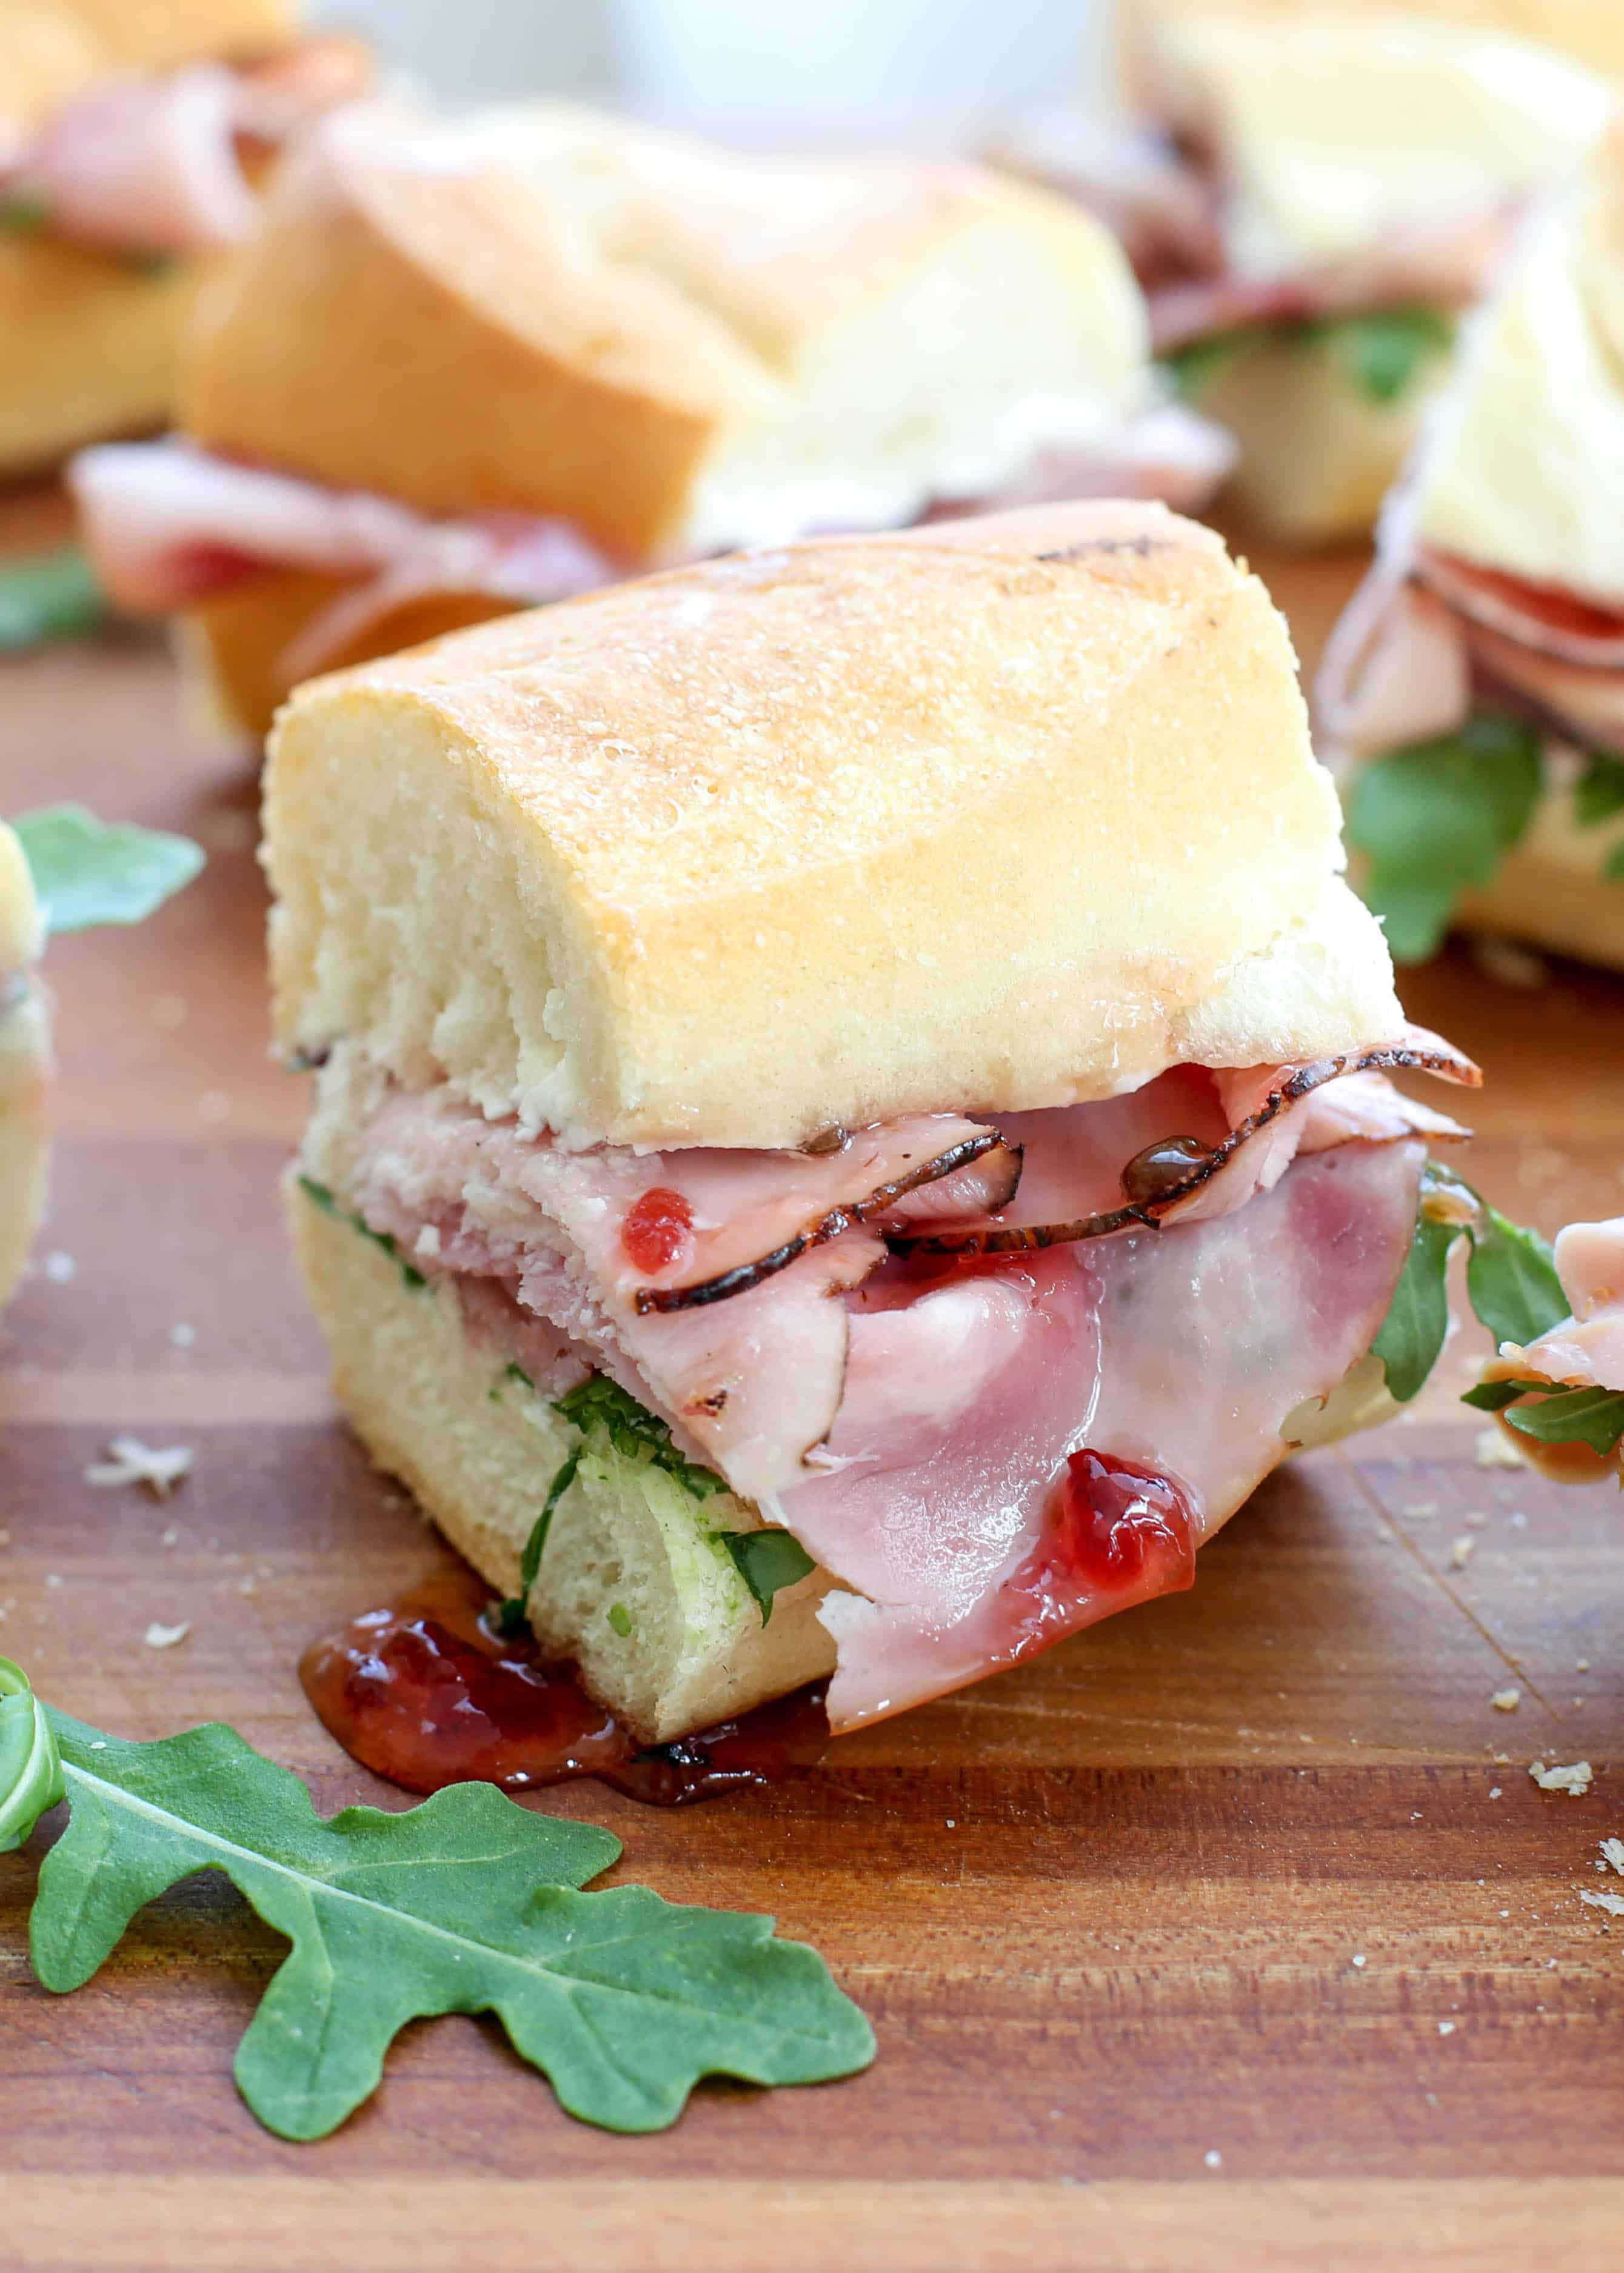 The Best Ham Sandwich You Ll Ever Eat Barefeetinthekitchen Com